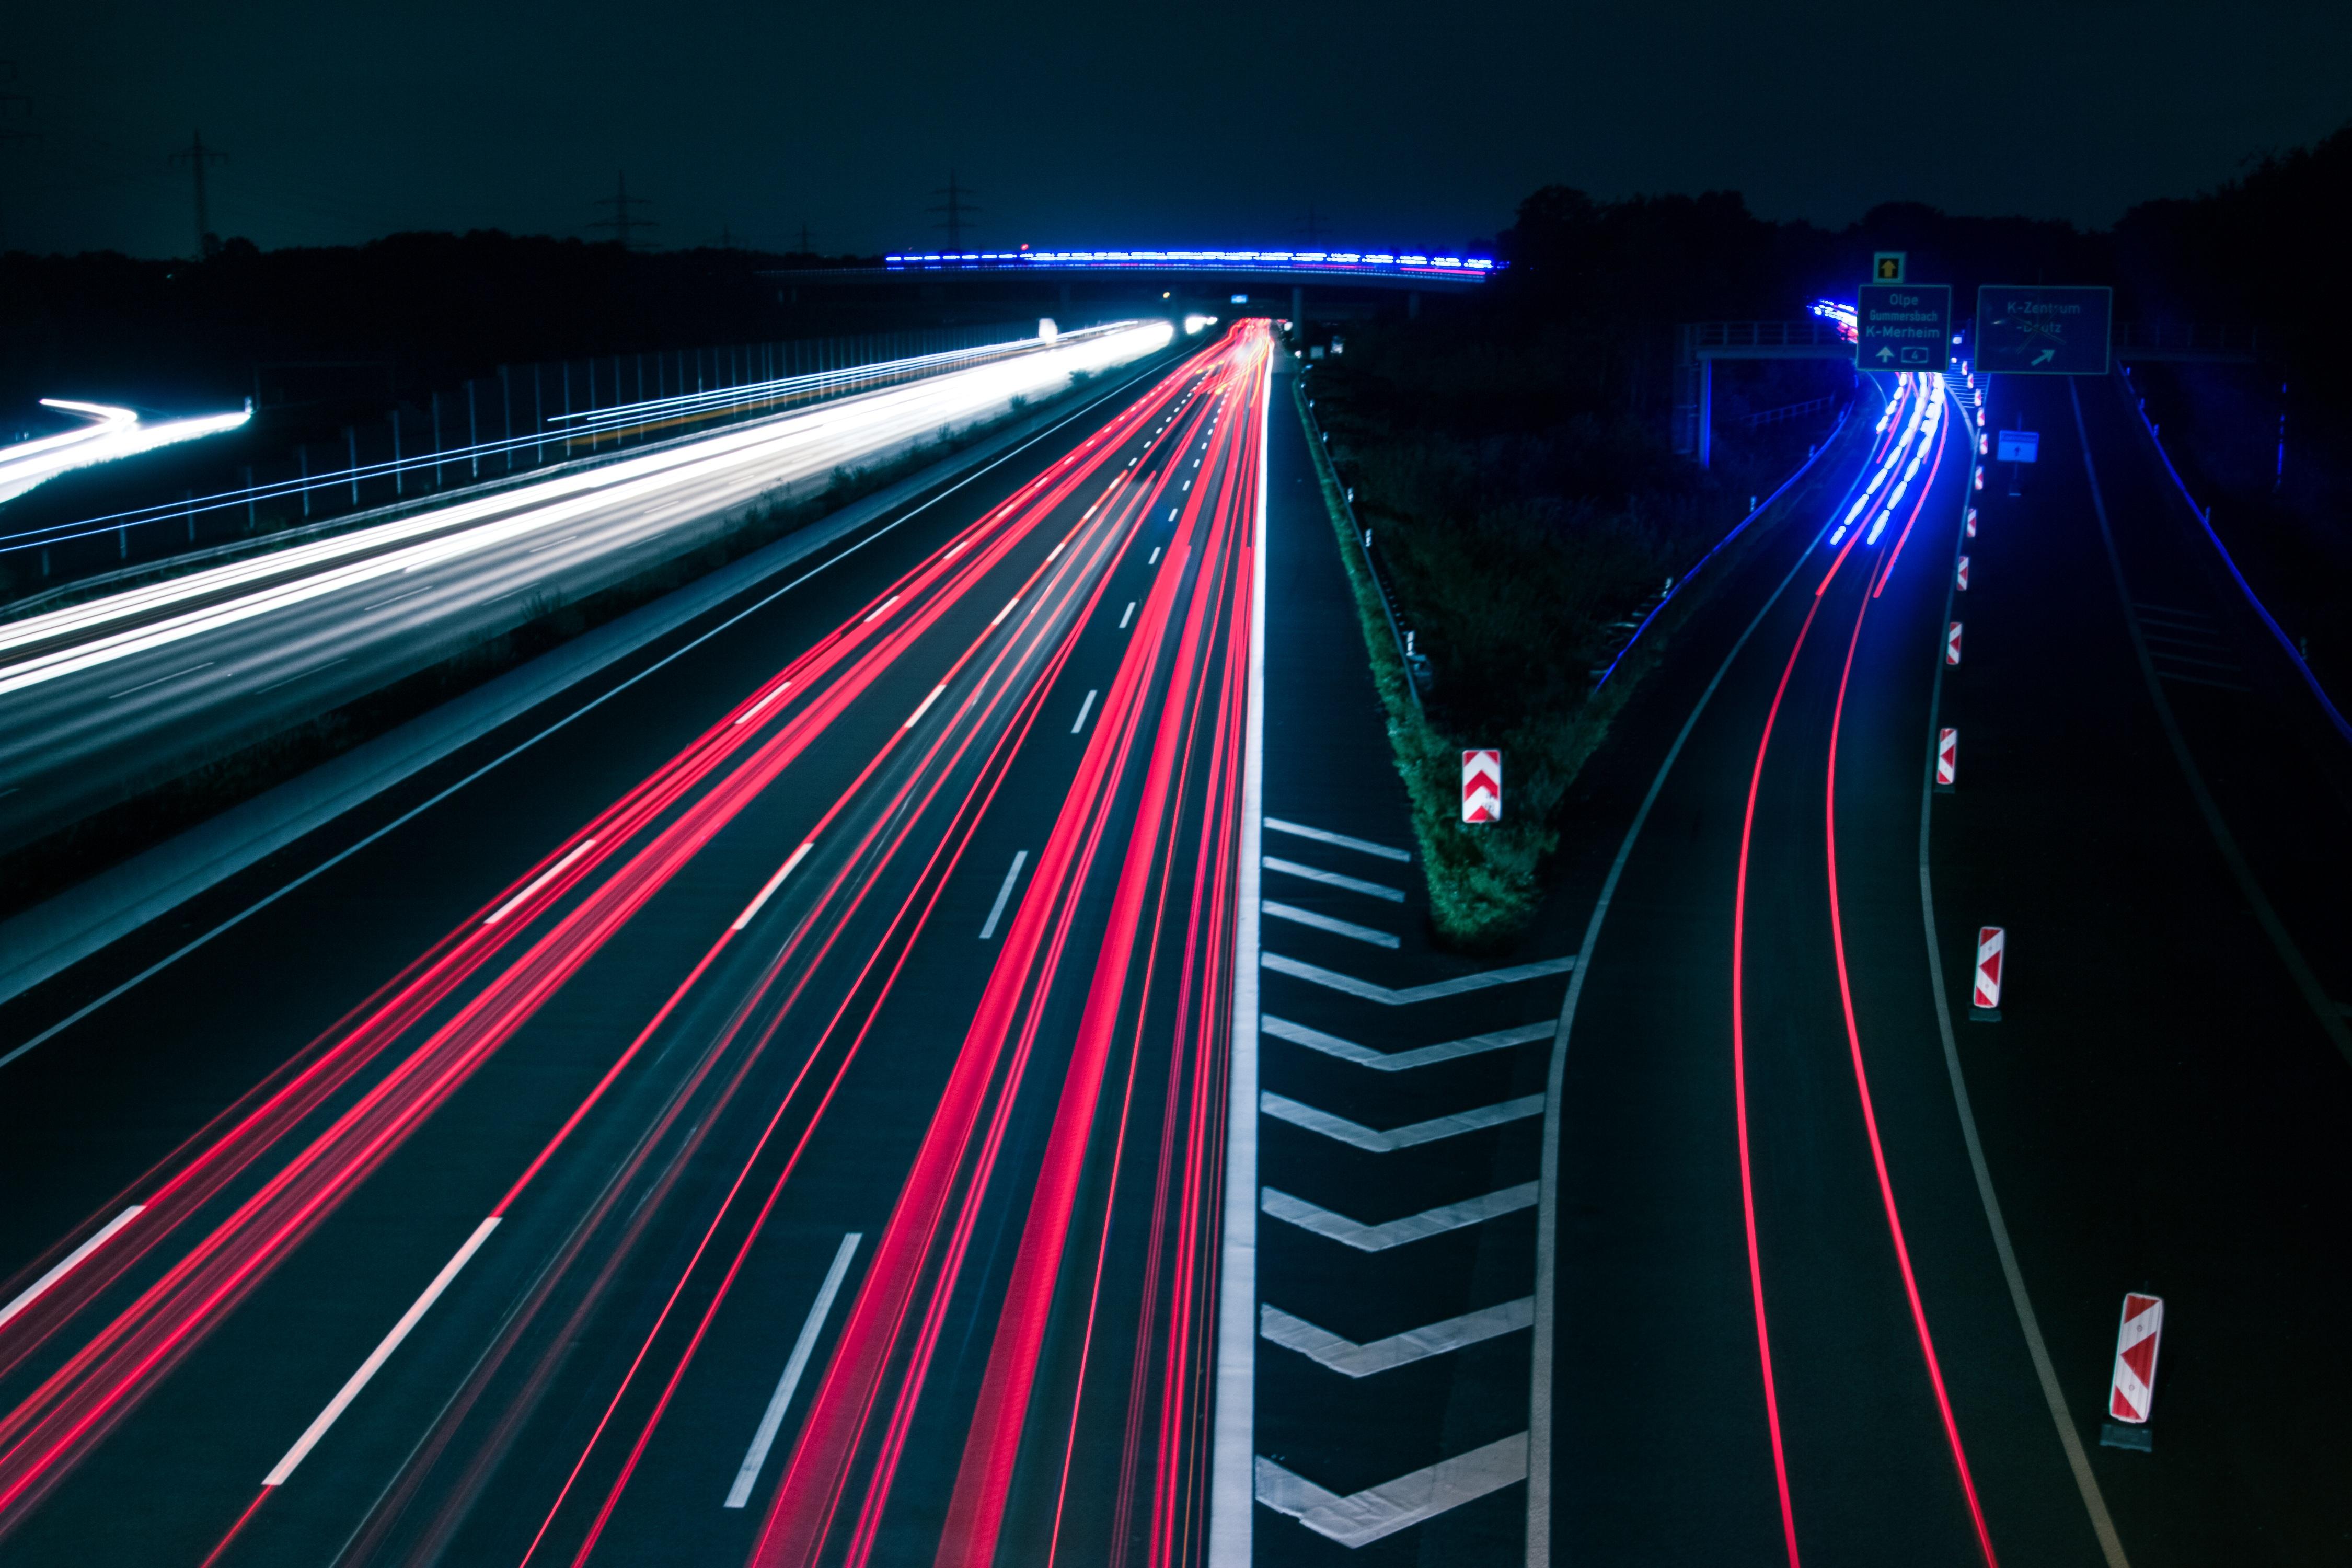 Fotos Gratis Tráfico Luces Autopista Noche Azul Rojo Blanco